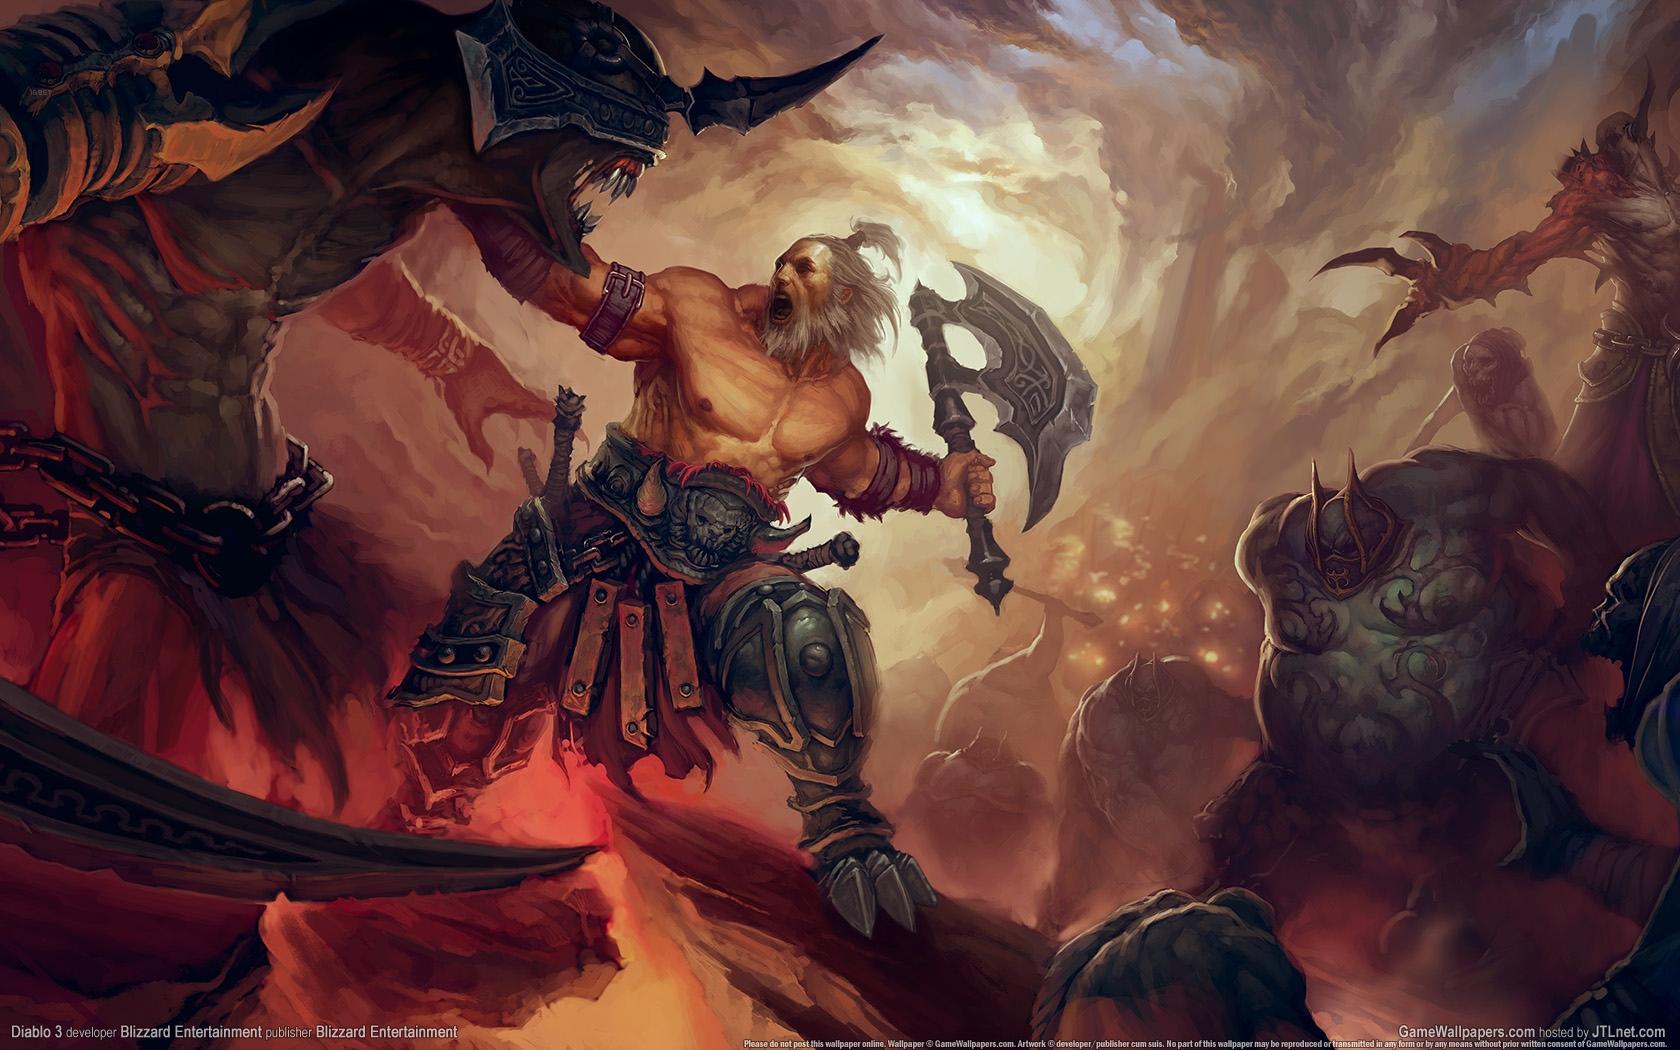 Barbarian Diablo Wallpaper 1680x1050 Barbarian Diablo III 1680x1050